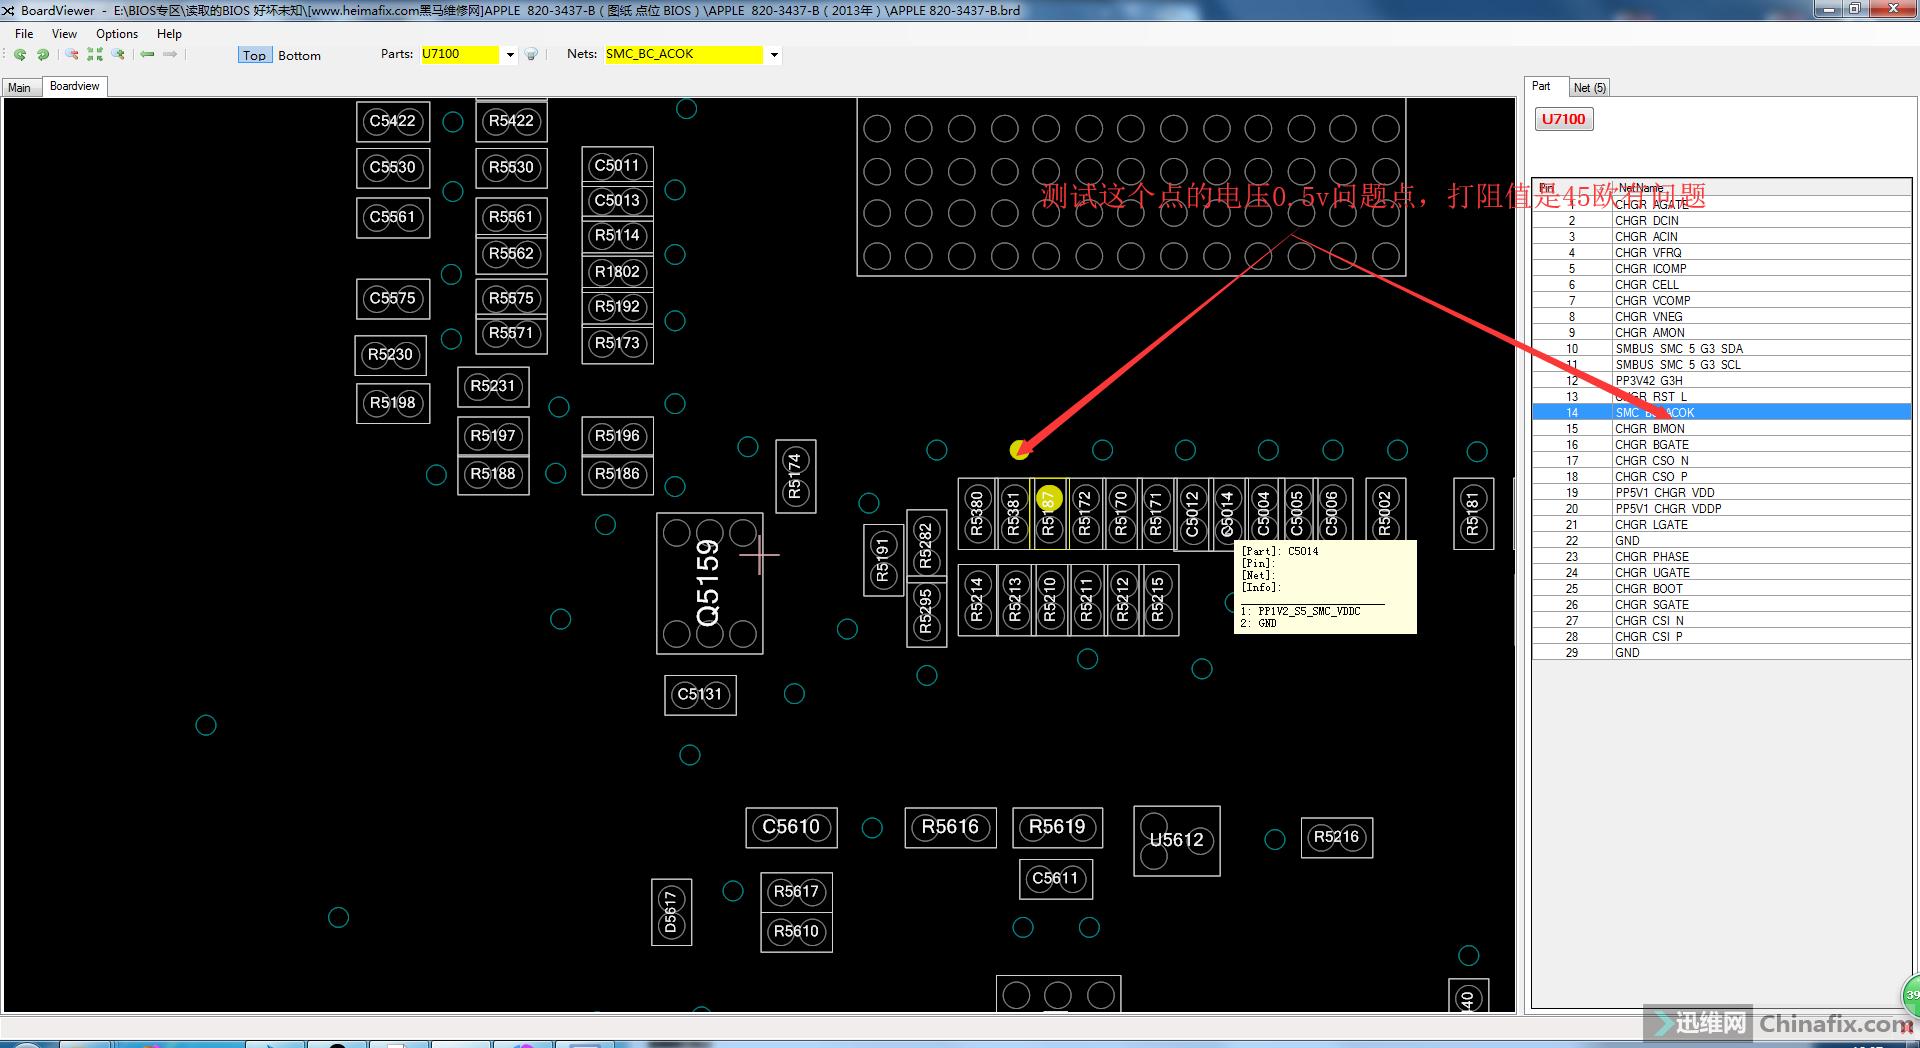 820-3437-B  ACOK问题点位图点图.png